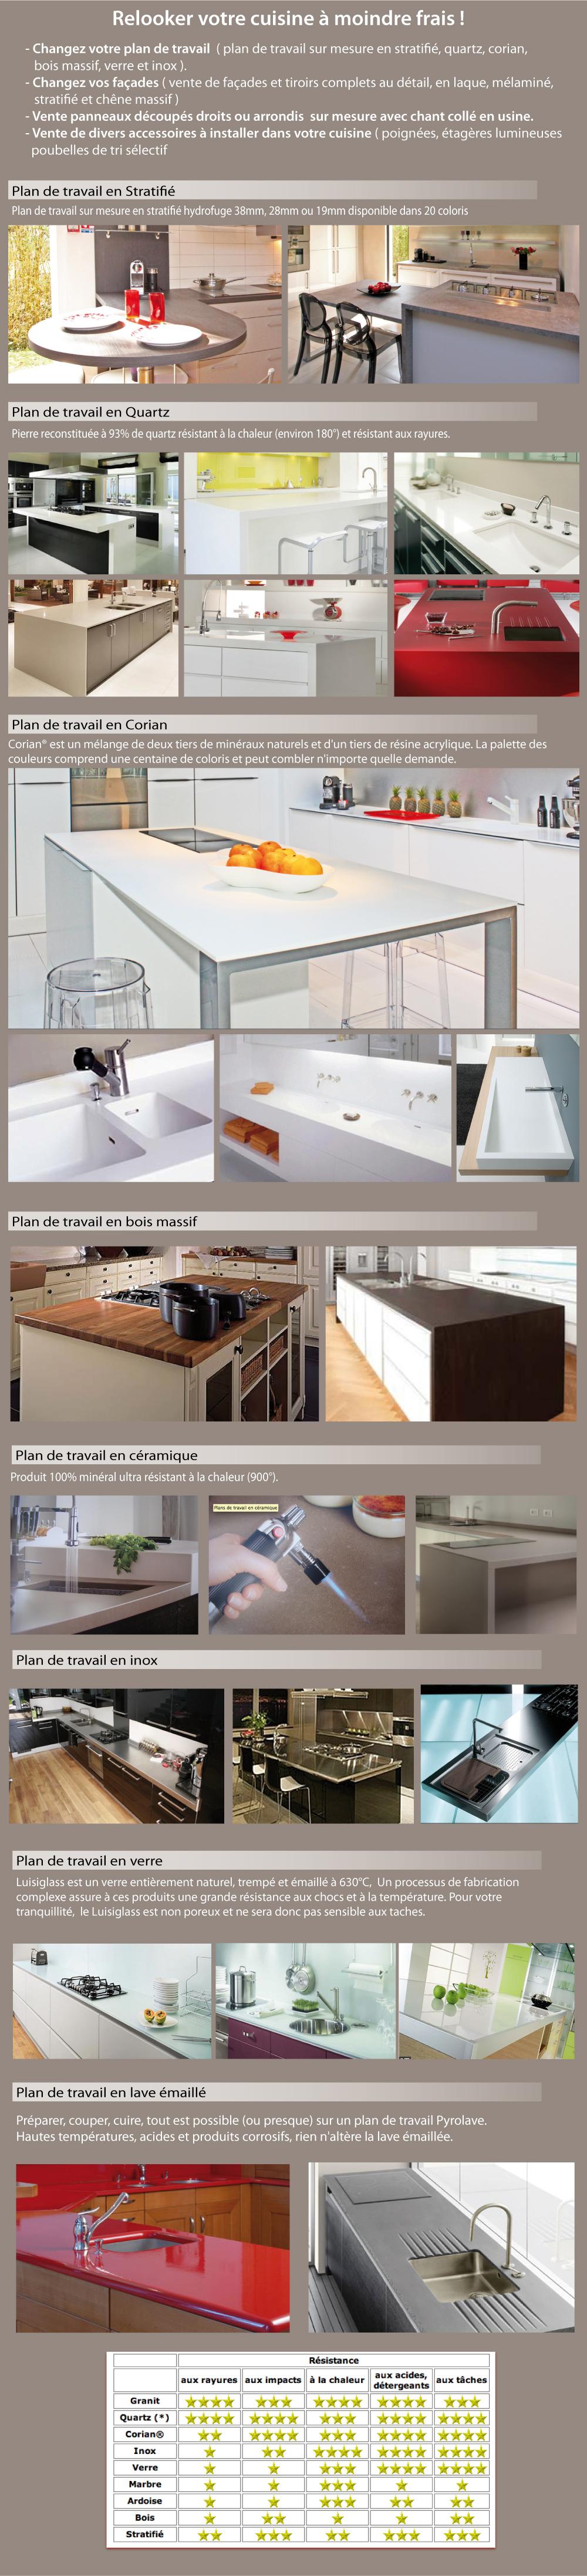 cuisine salle de bain rangement living dressing fabricant cuisine salle de bain rangement living. Black Bedroom Furniture Sets. Home Design Ideas